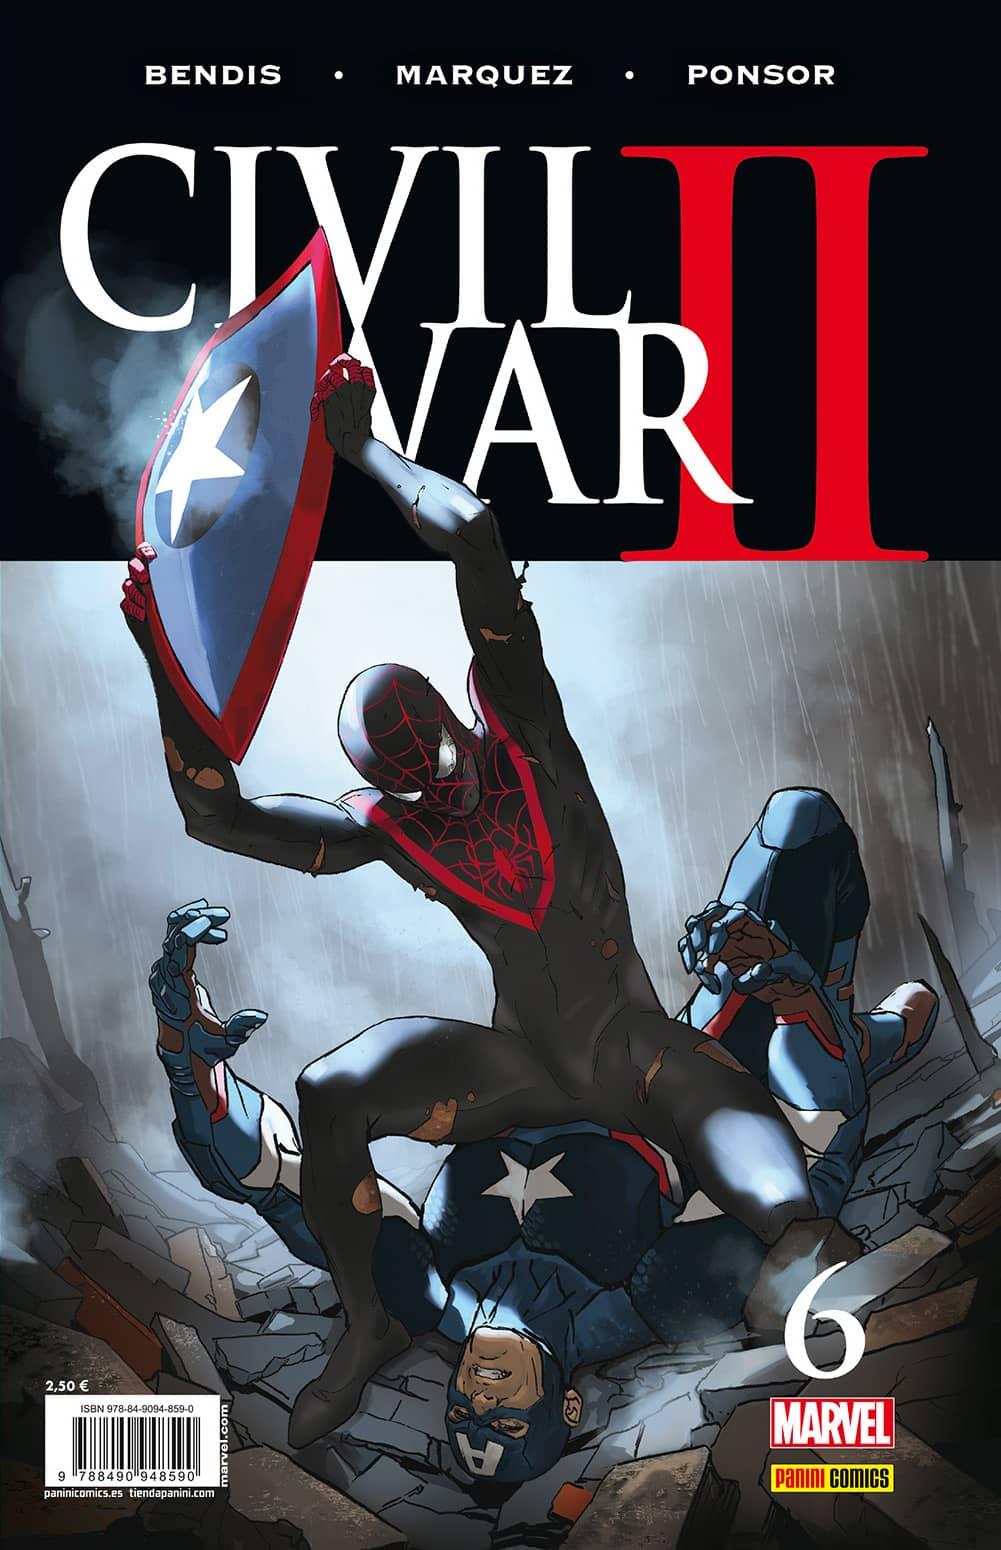 CIVIL WAR II N. 6